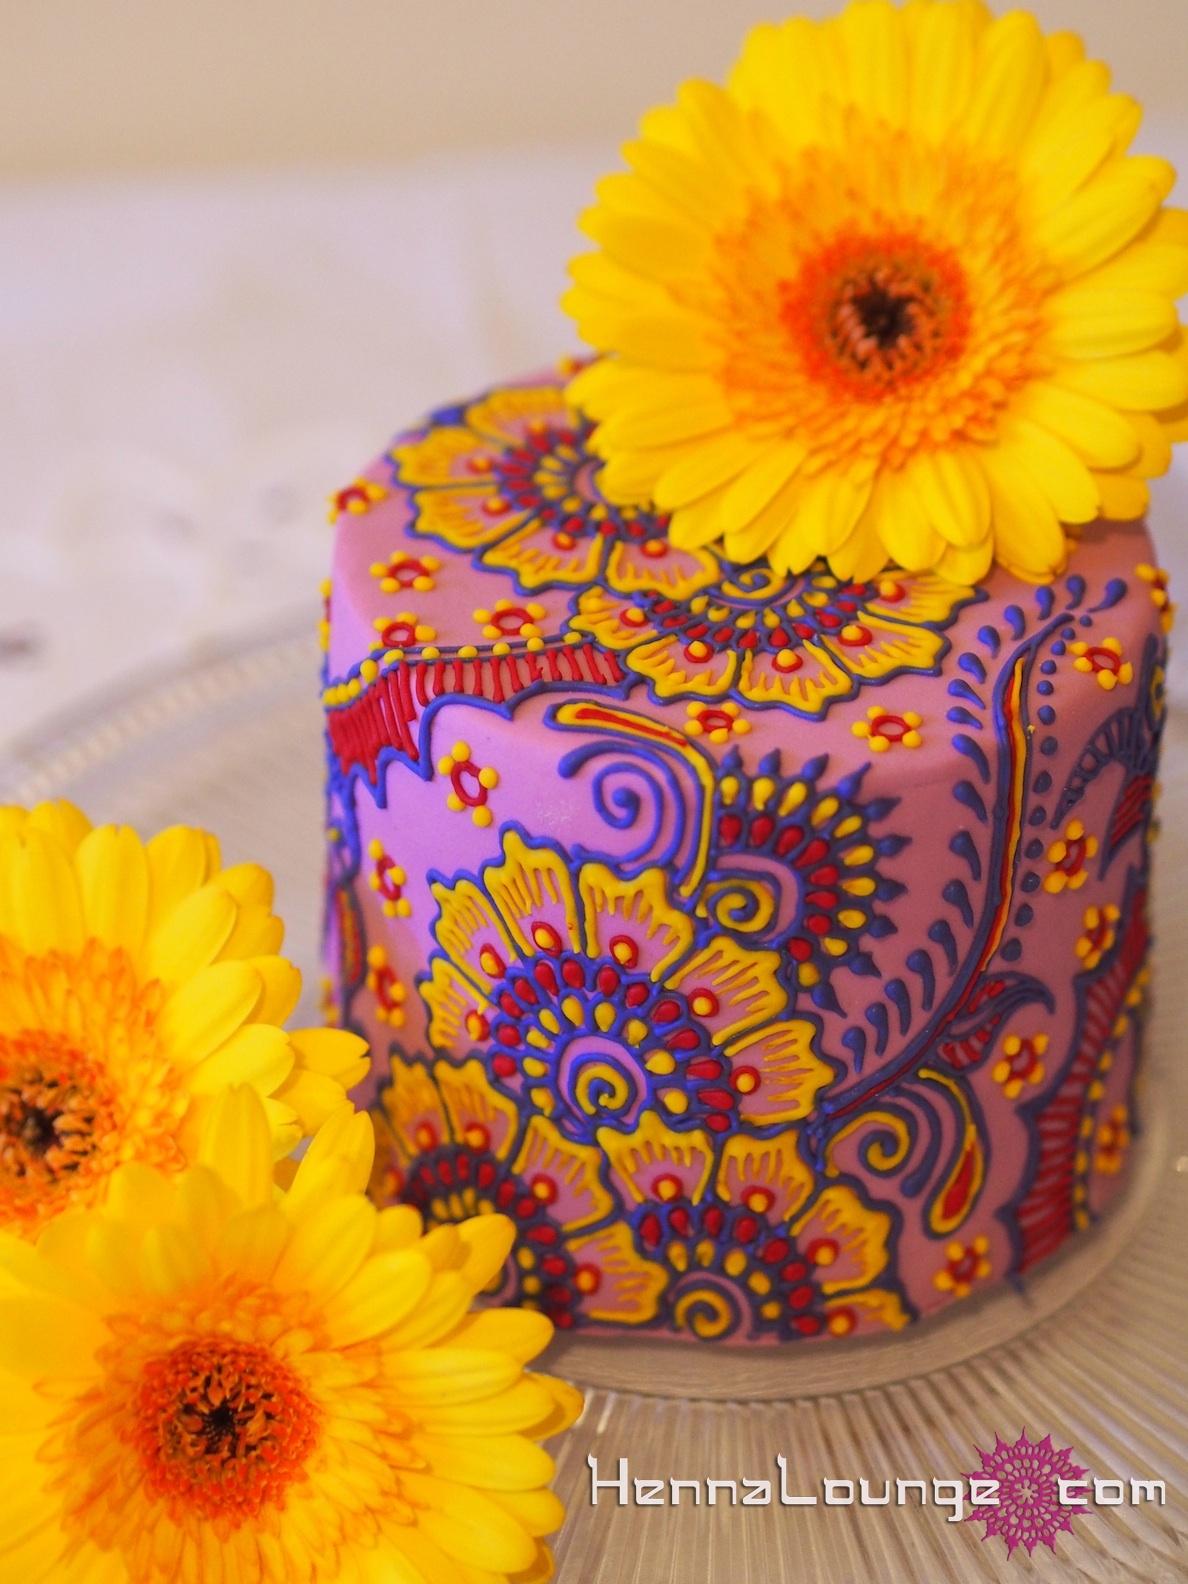 Henna Cakes And Art Henna Lounge